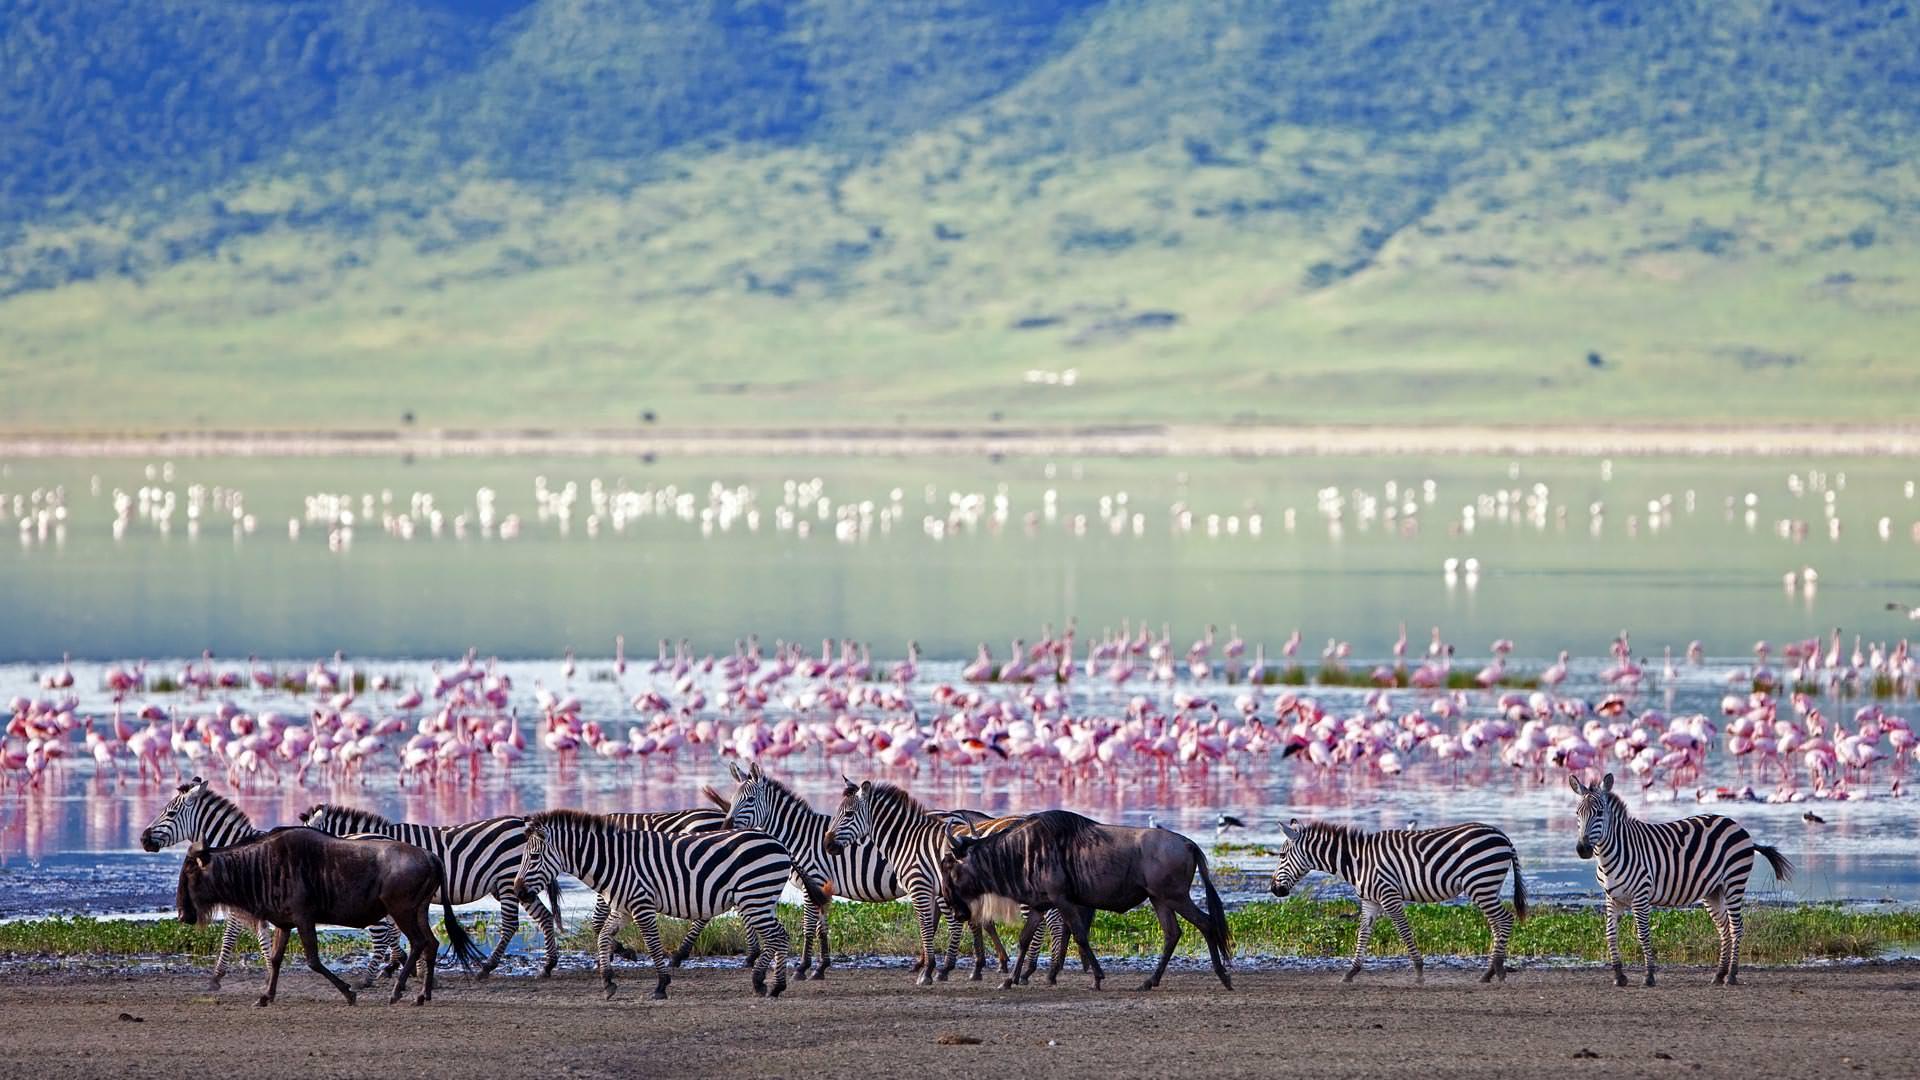 Zebra, wildebeest and flamingo in Ngorongoro Crater